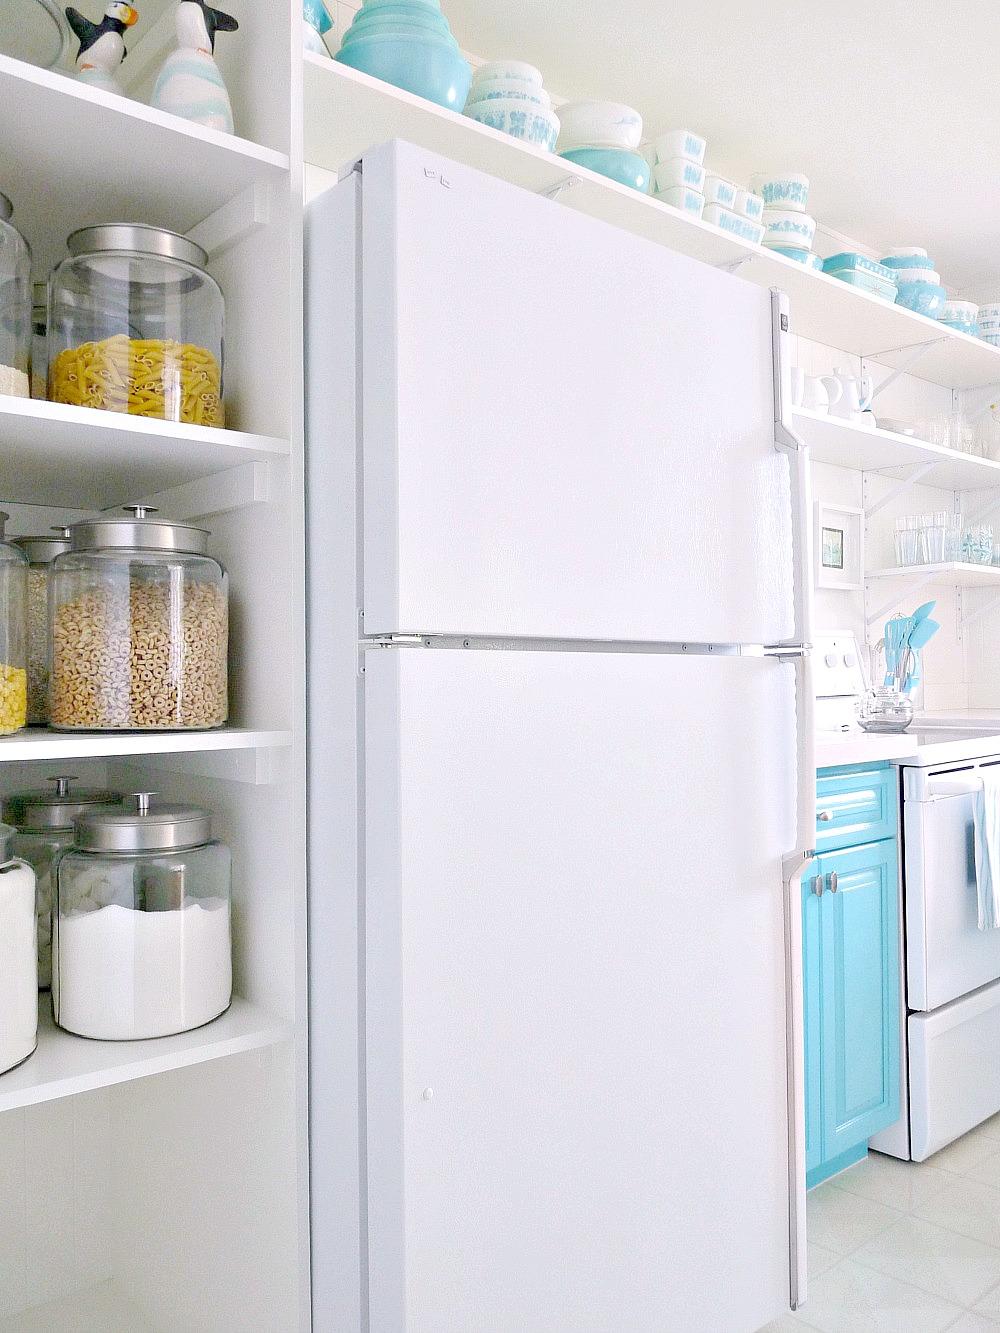 Montana Glass Storage Canisters - Large Glass Food Storage, Retro Look